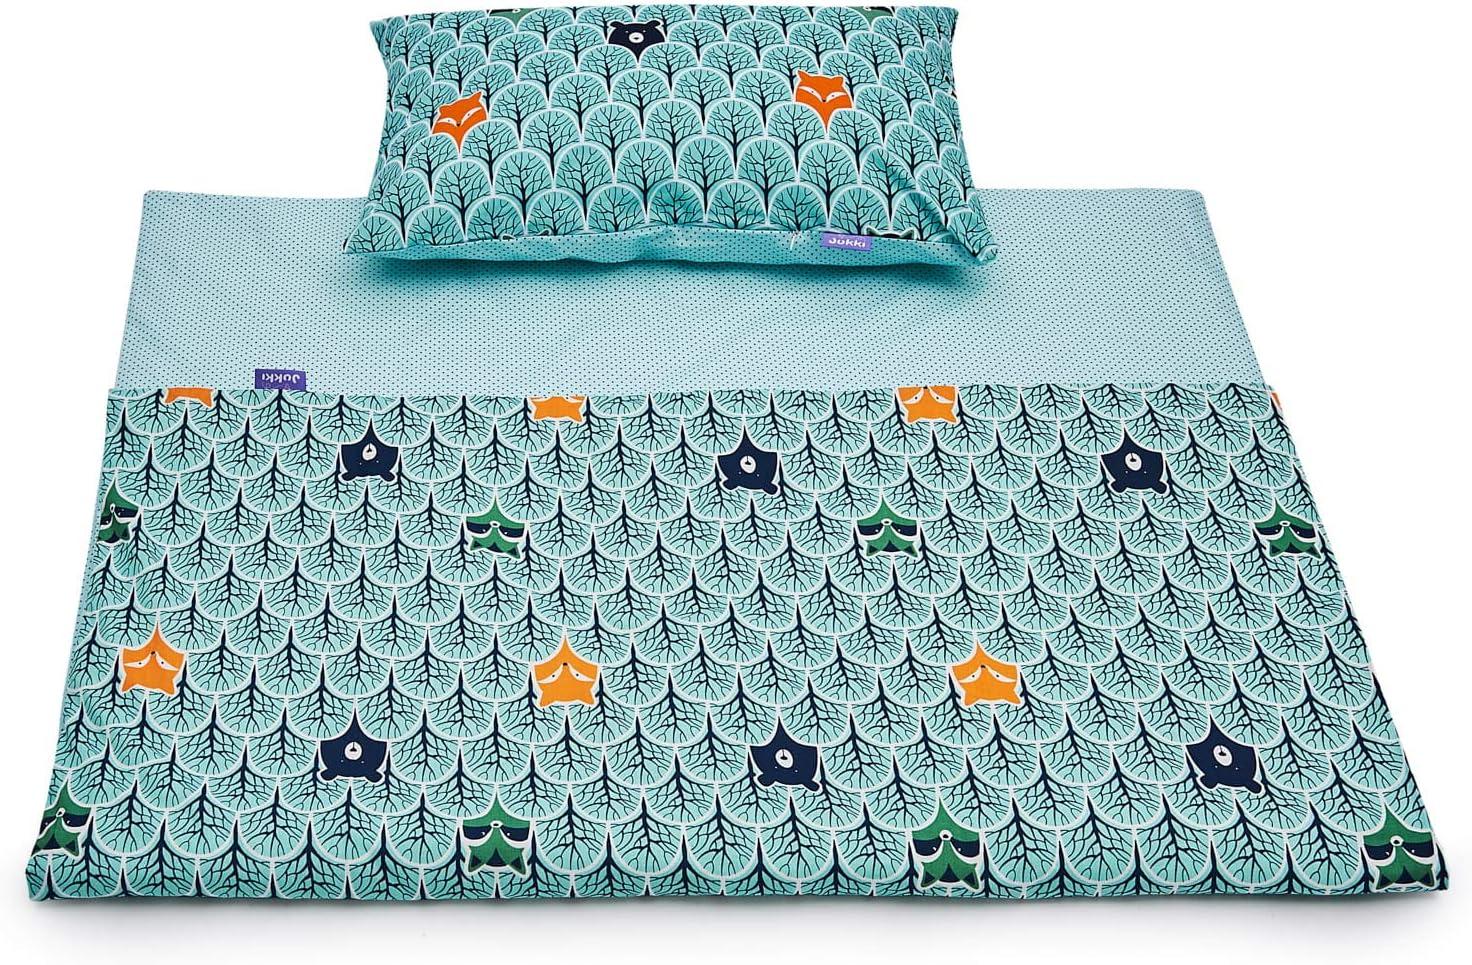 Baby toddler cot cot bed set duvet cover pillowcase 100/%cotton kitten red heart